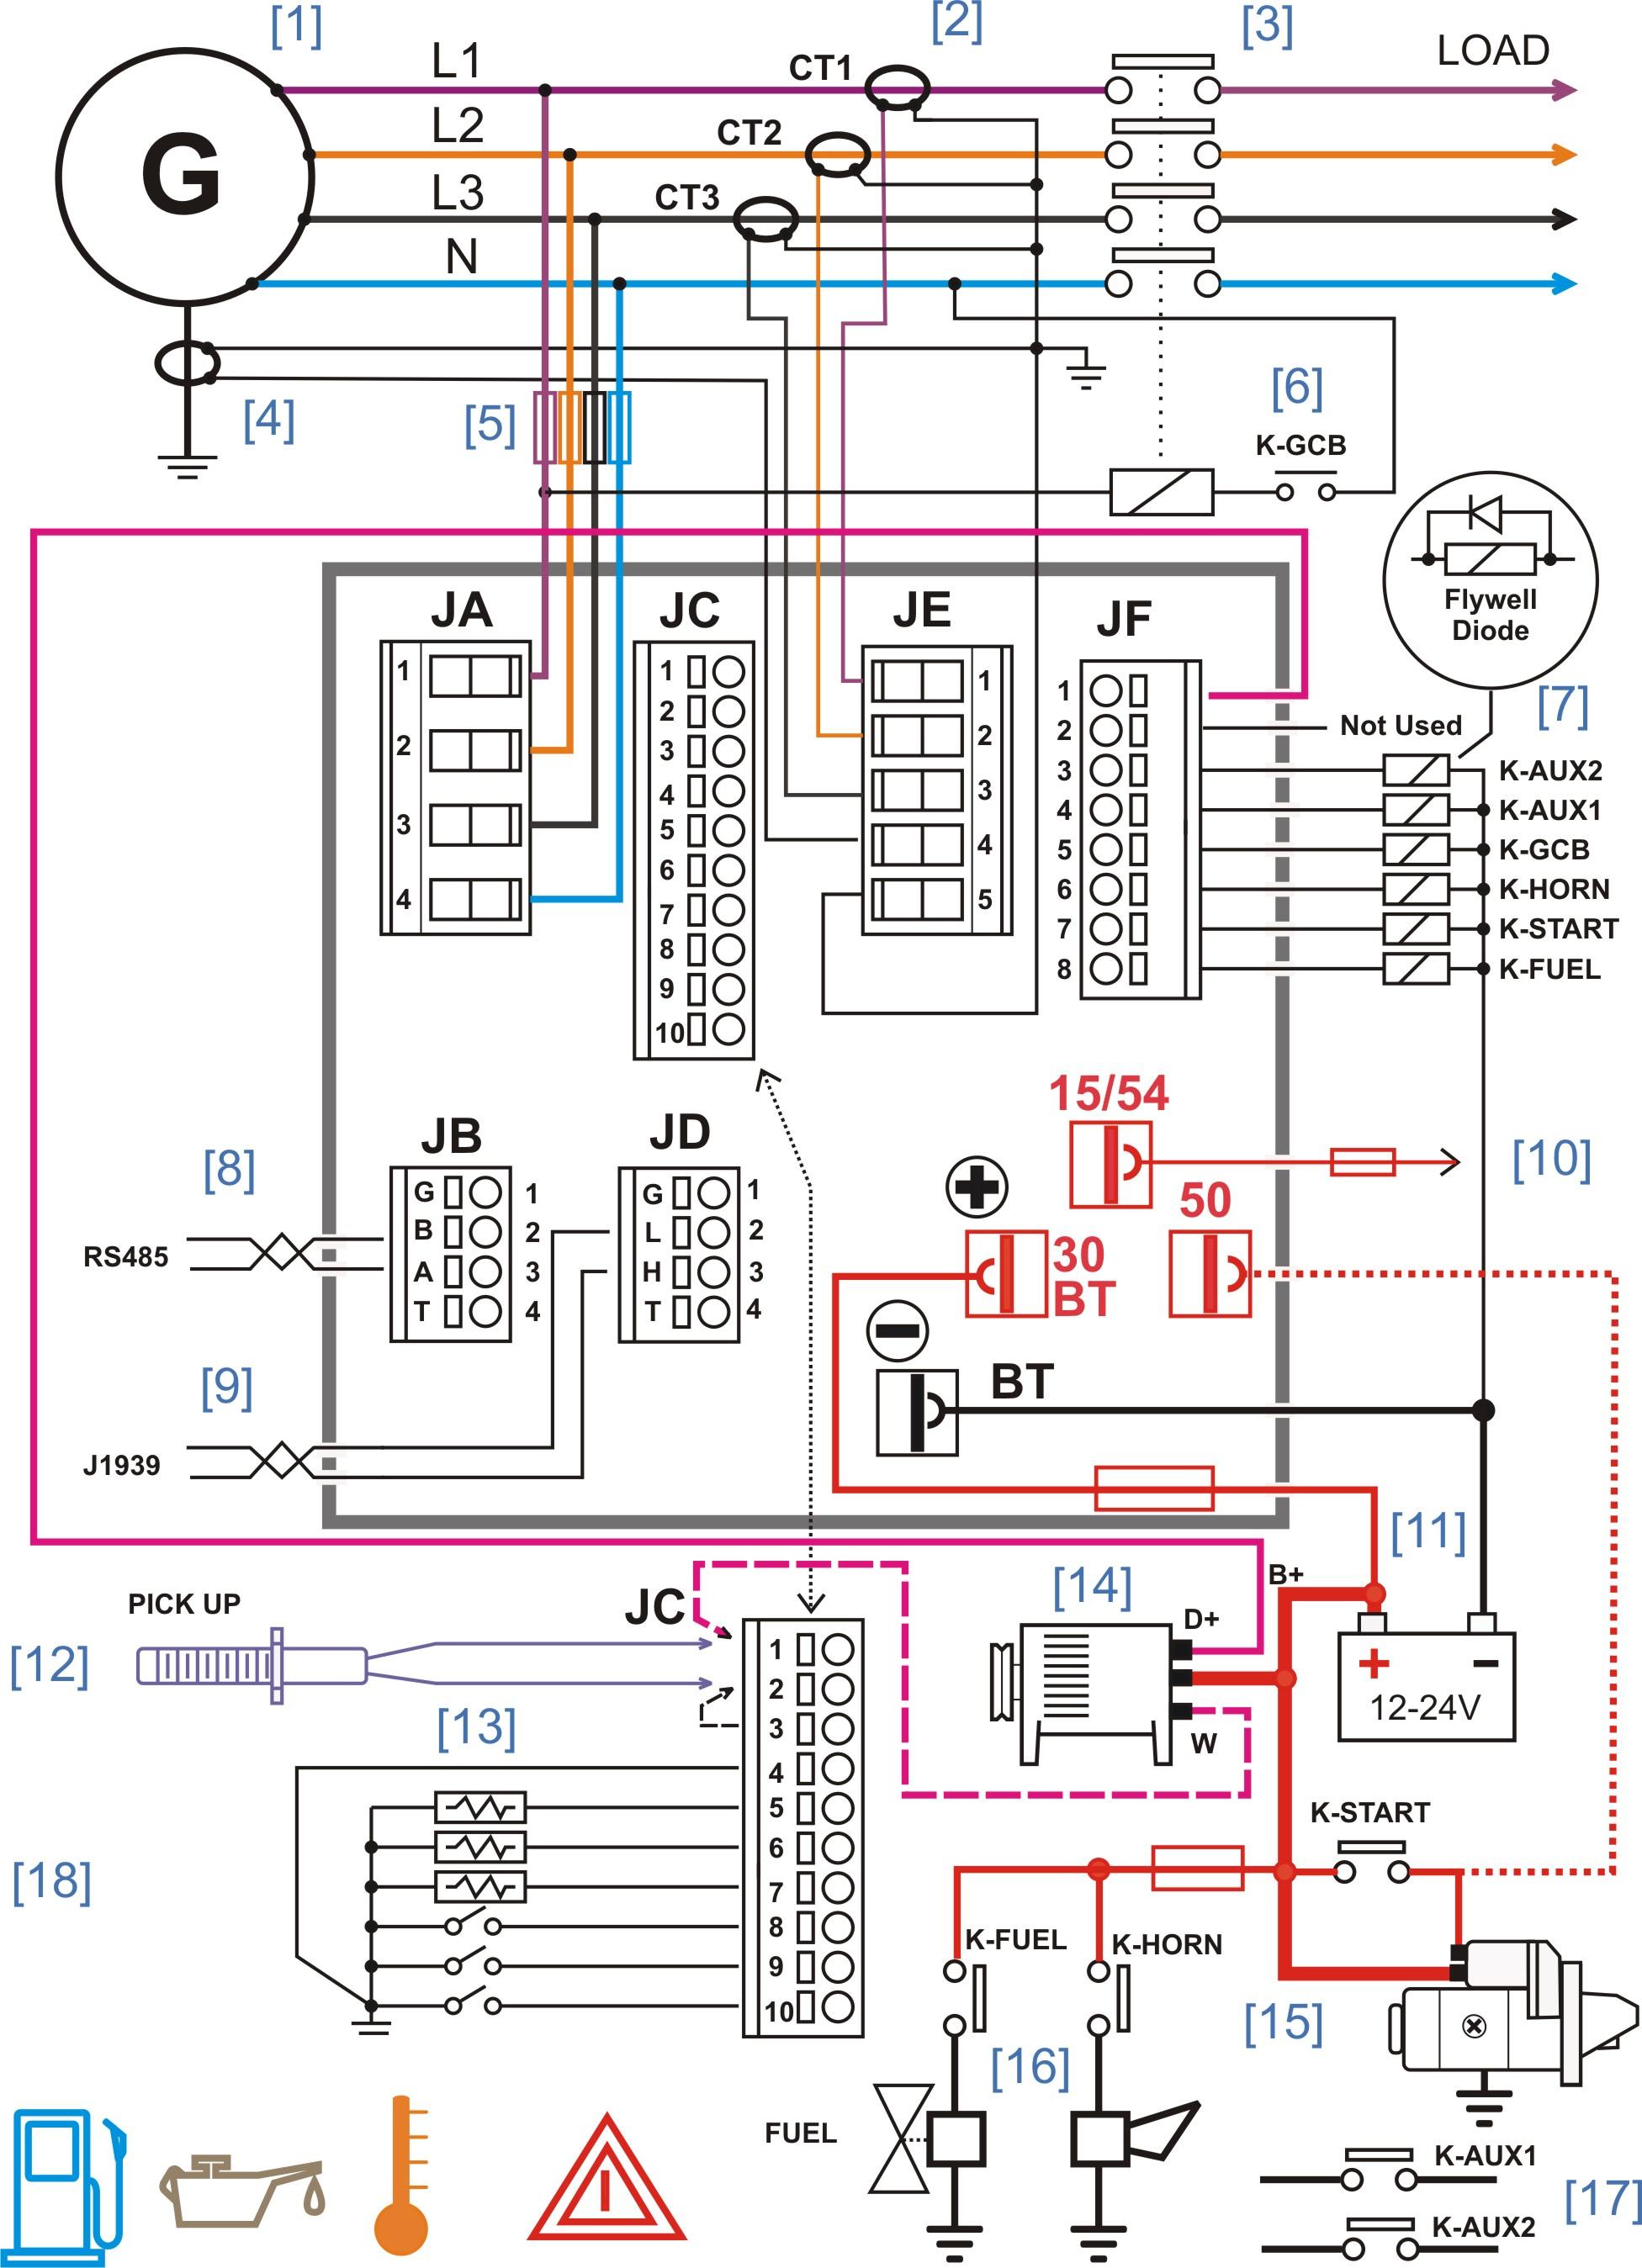 Wiring Diagram Maker | Wiring Diagram - Wiring Diagram Software